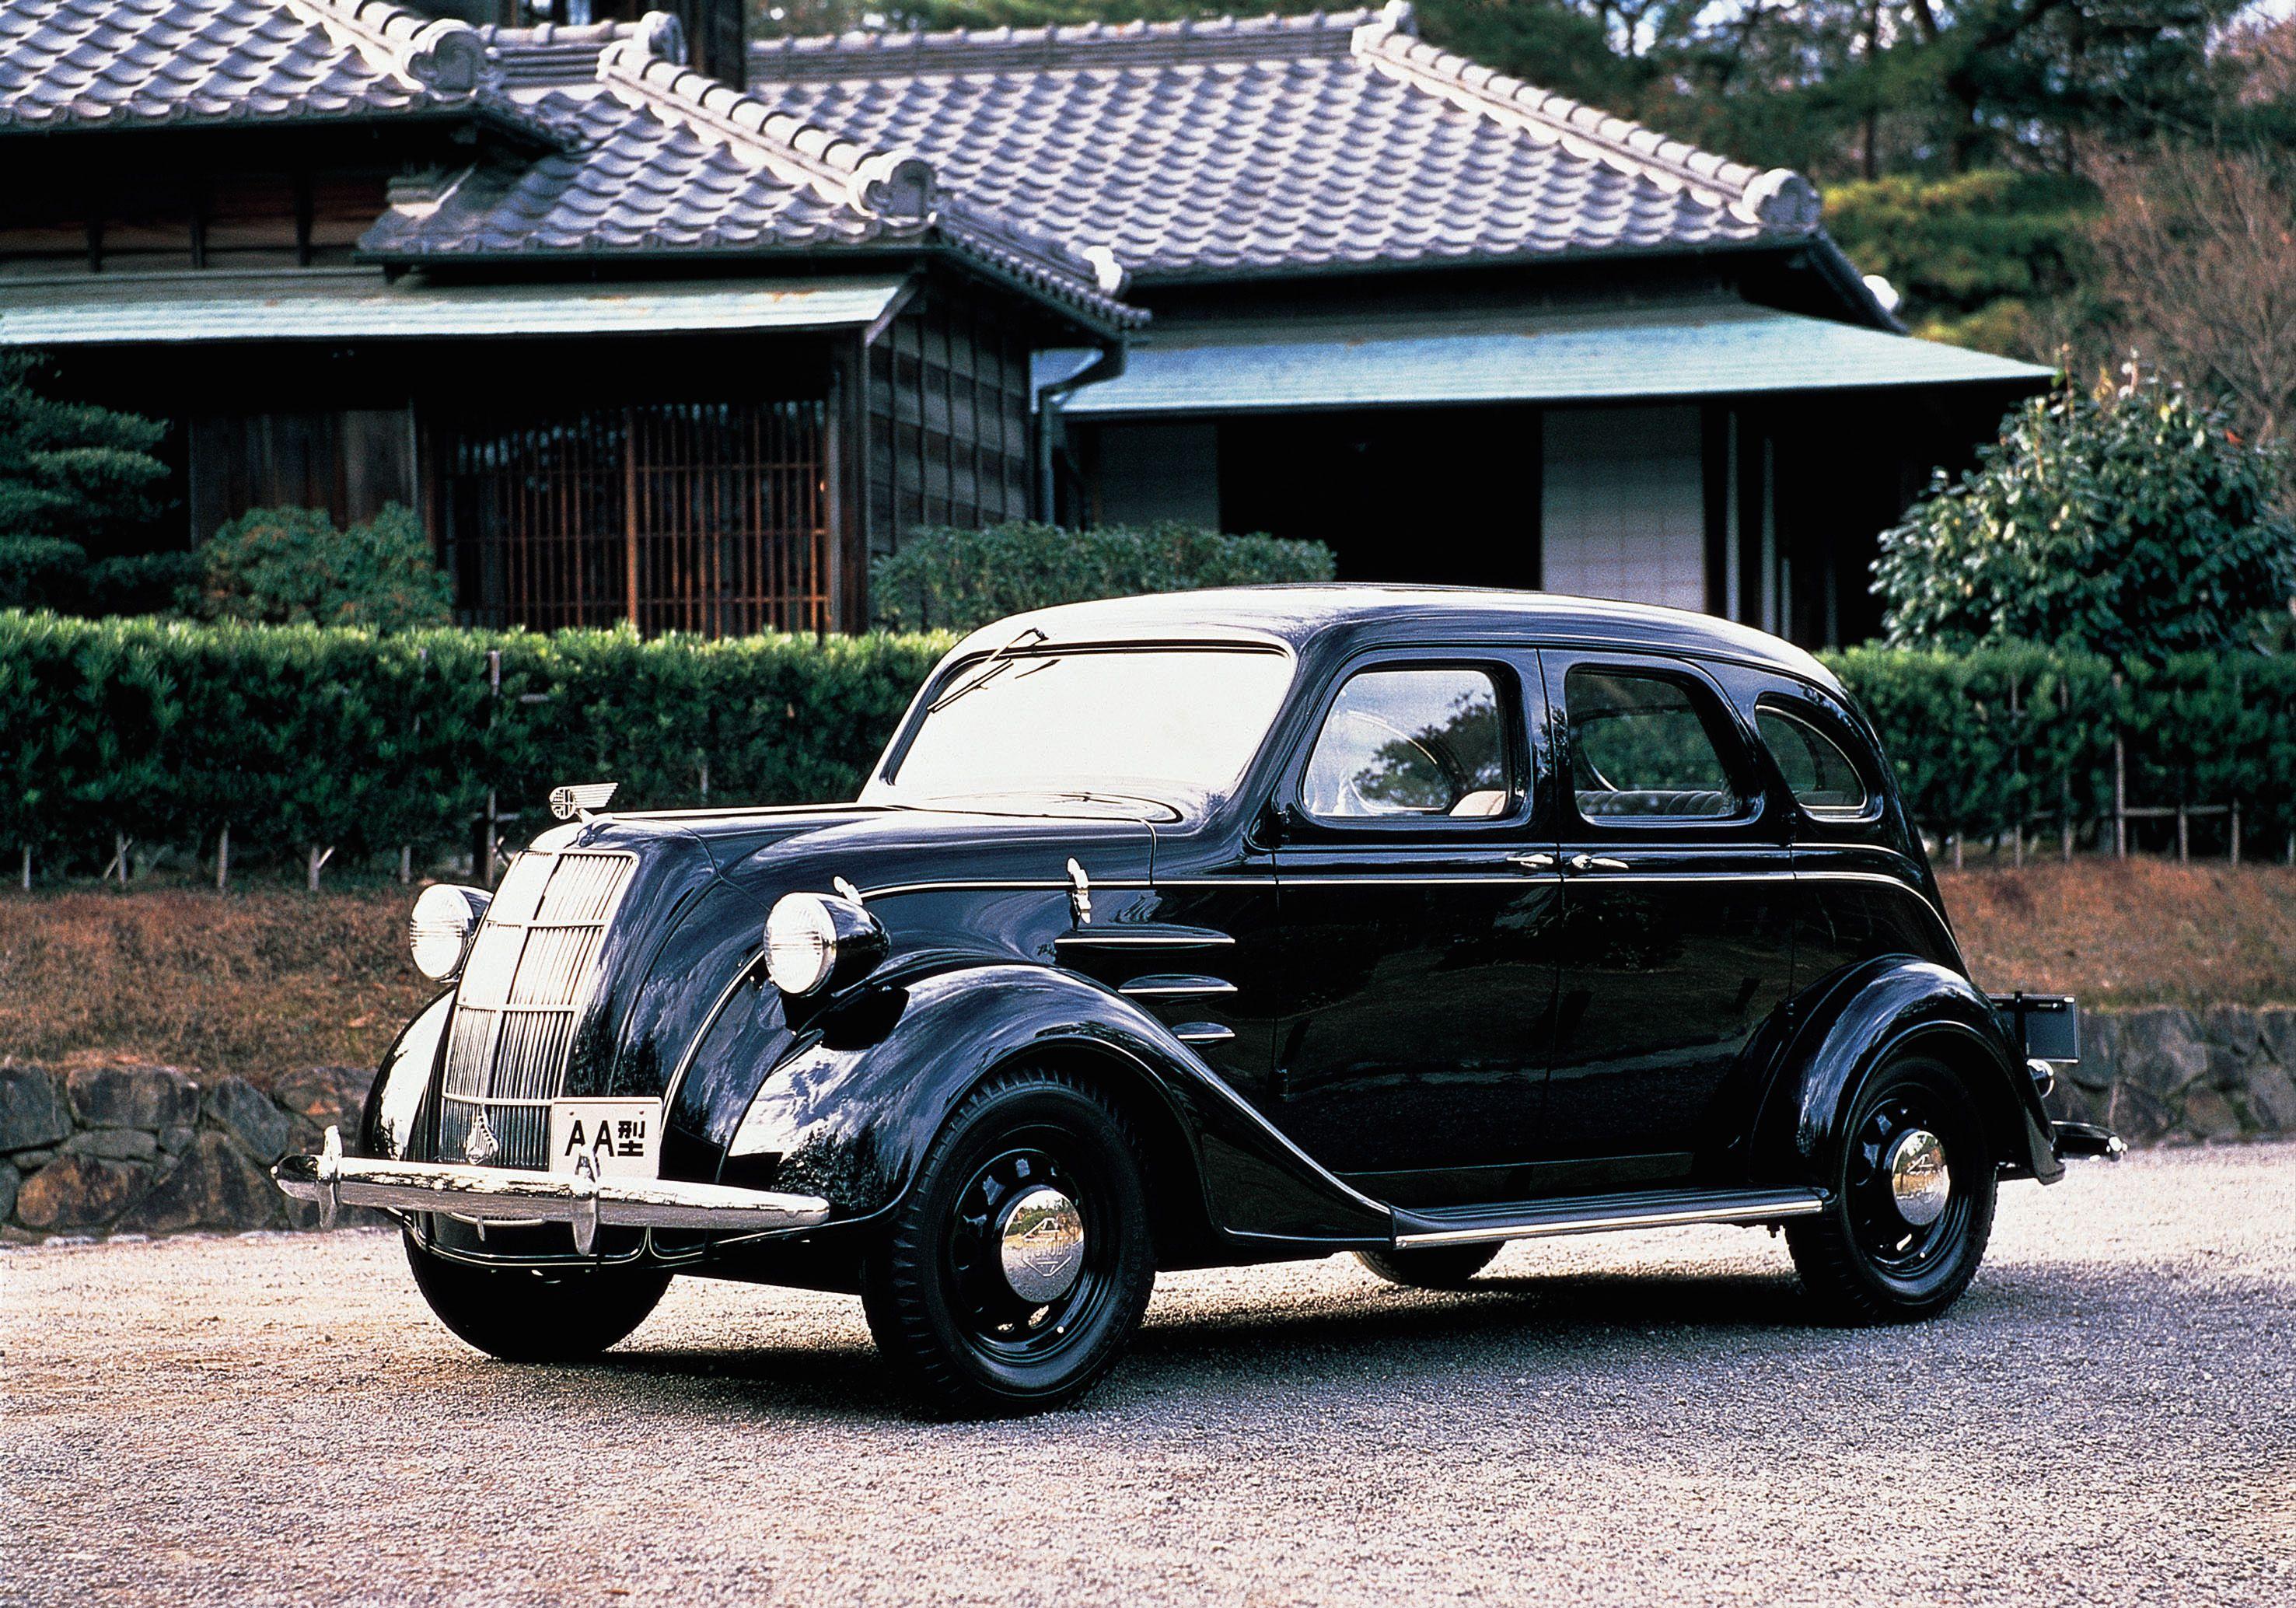 Kelebihan Kekurangan Toyota Aa Murah Berkualitas